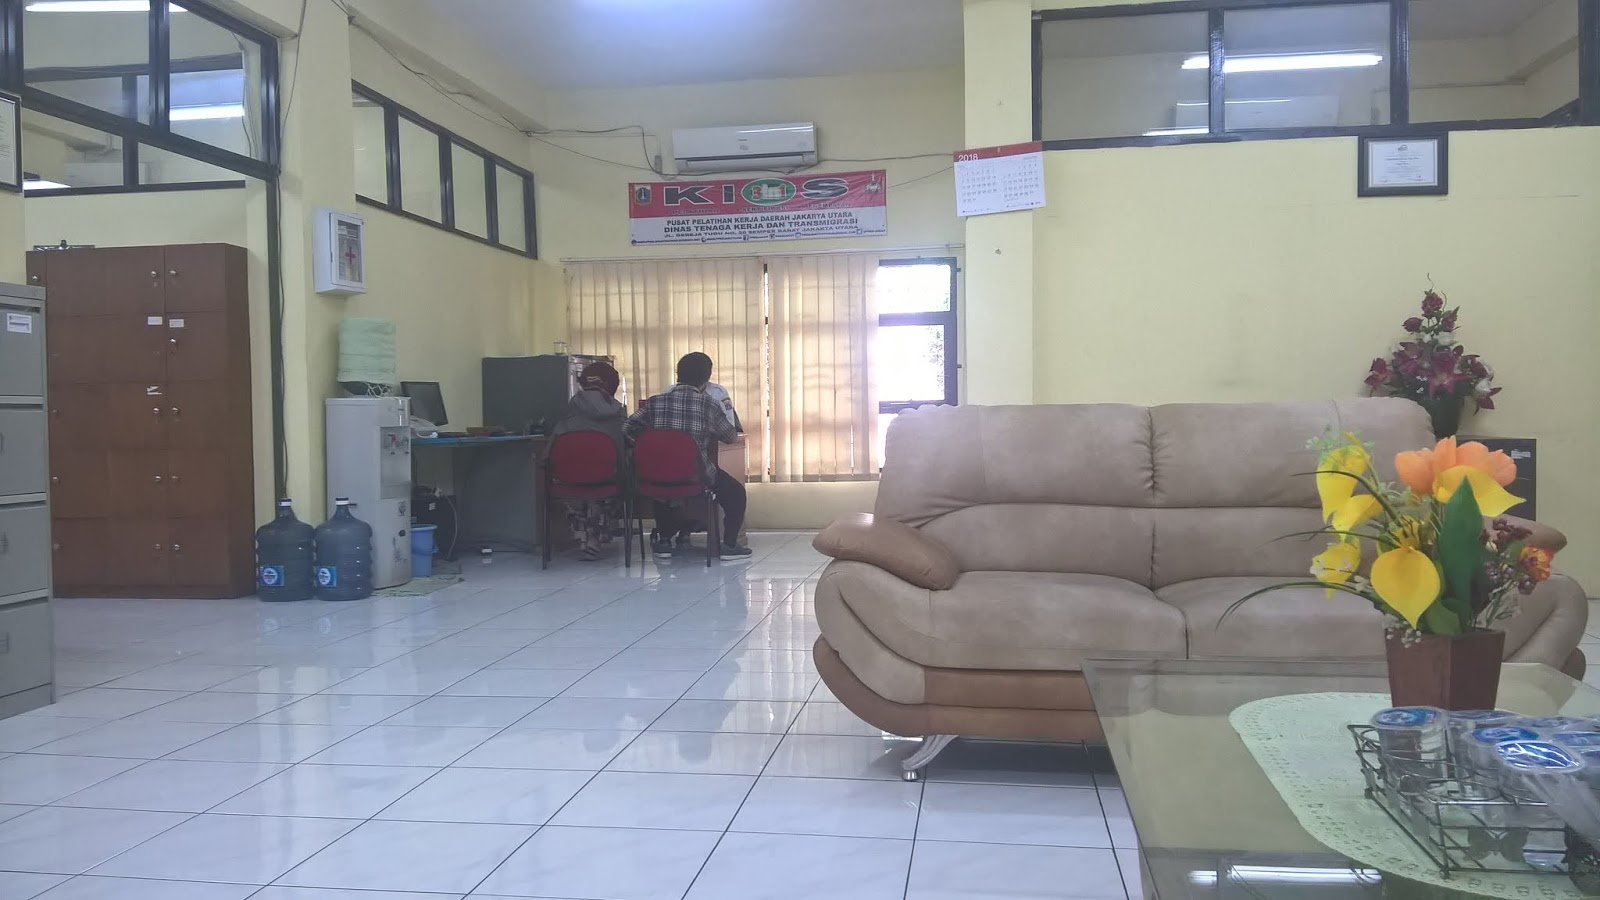 Pusat Latihan Kerja Daerah Jakarta utara